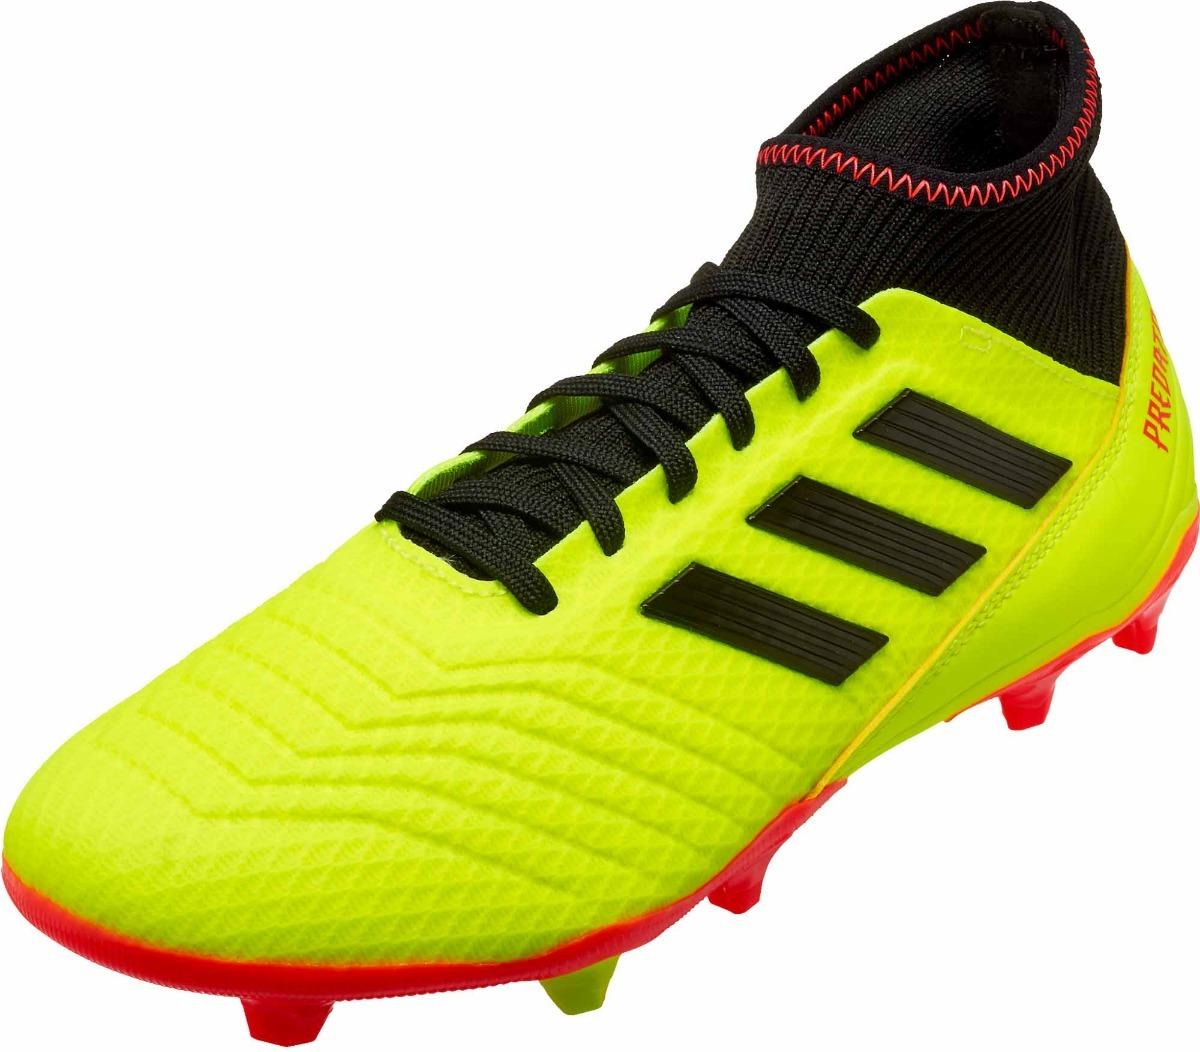 7f22ee1e1c604 zapatos de fútbol adidas predator 18.3 fg  rincón del fútbol. Cargando zoom.